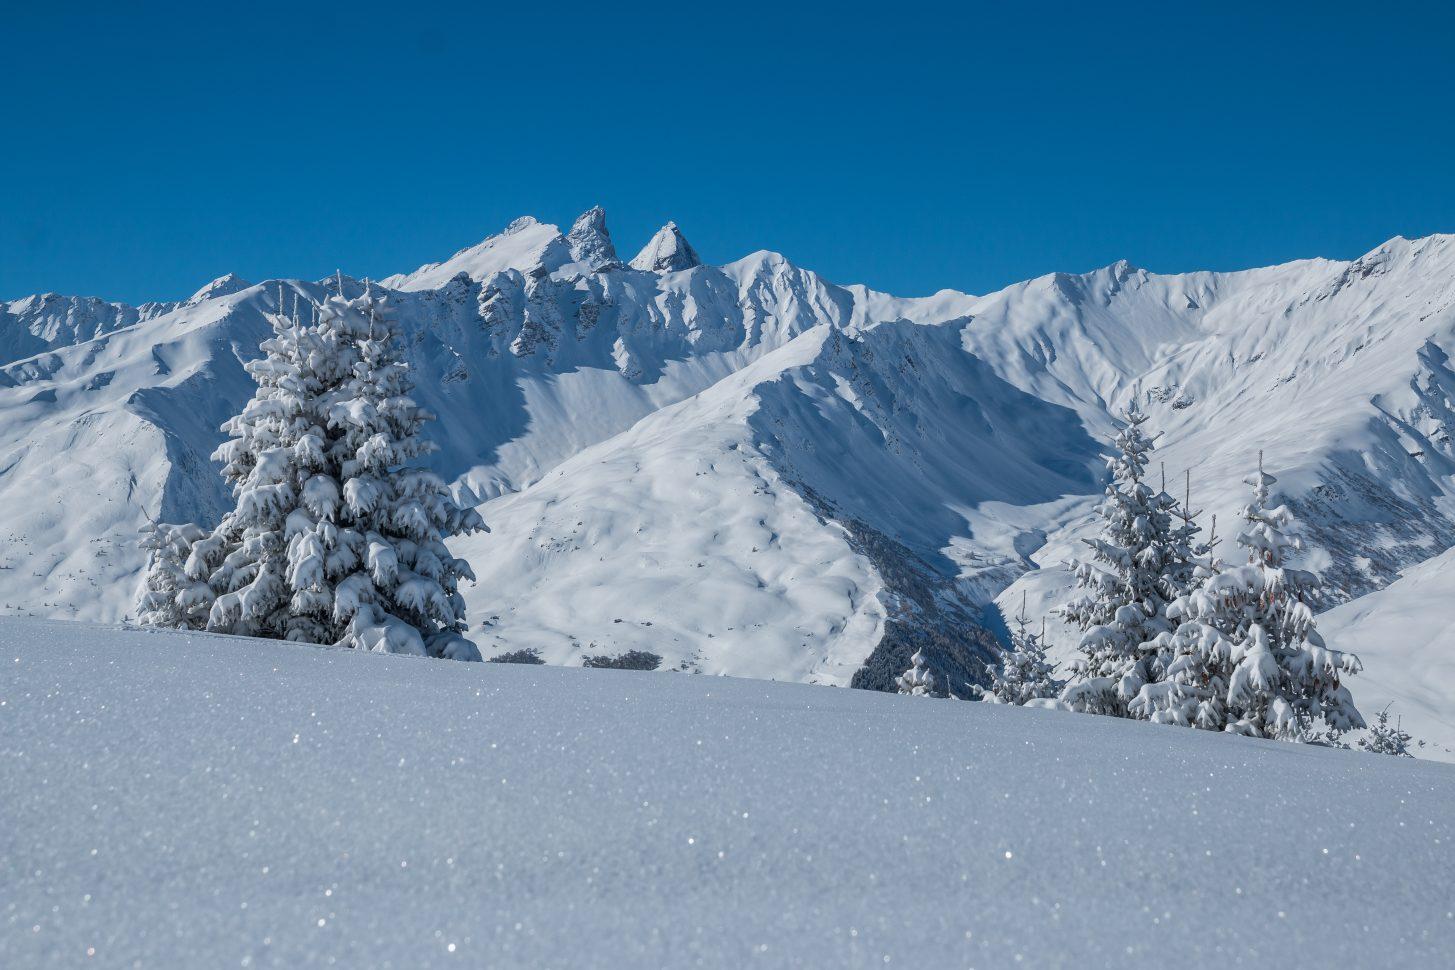 Paysage hivernal - Valloire Galibier Savoie France